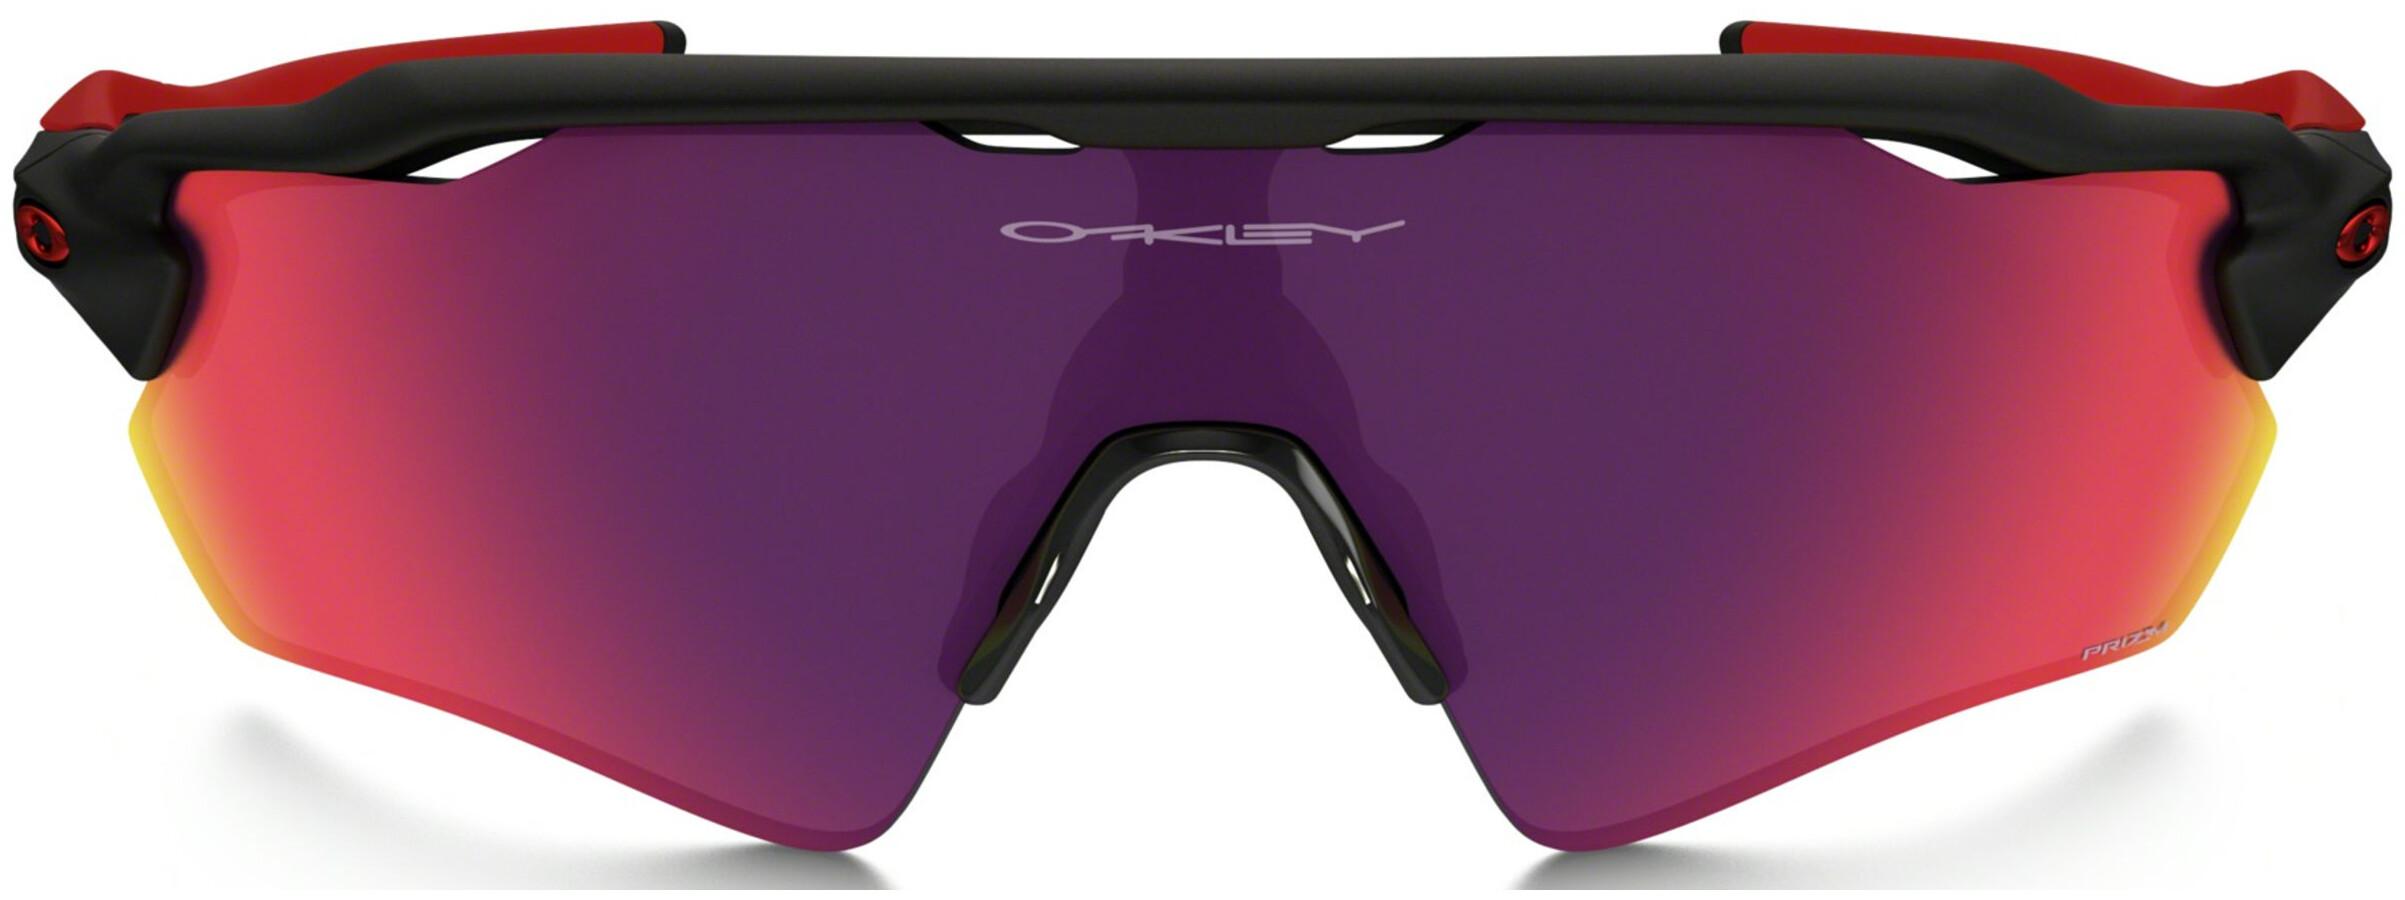 e6b79c395e Oakley Radar EV XS Path - Gafas ciclismo - rojo/negro | Bikester.es